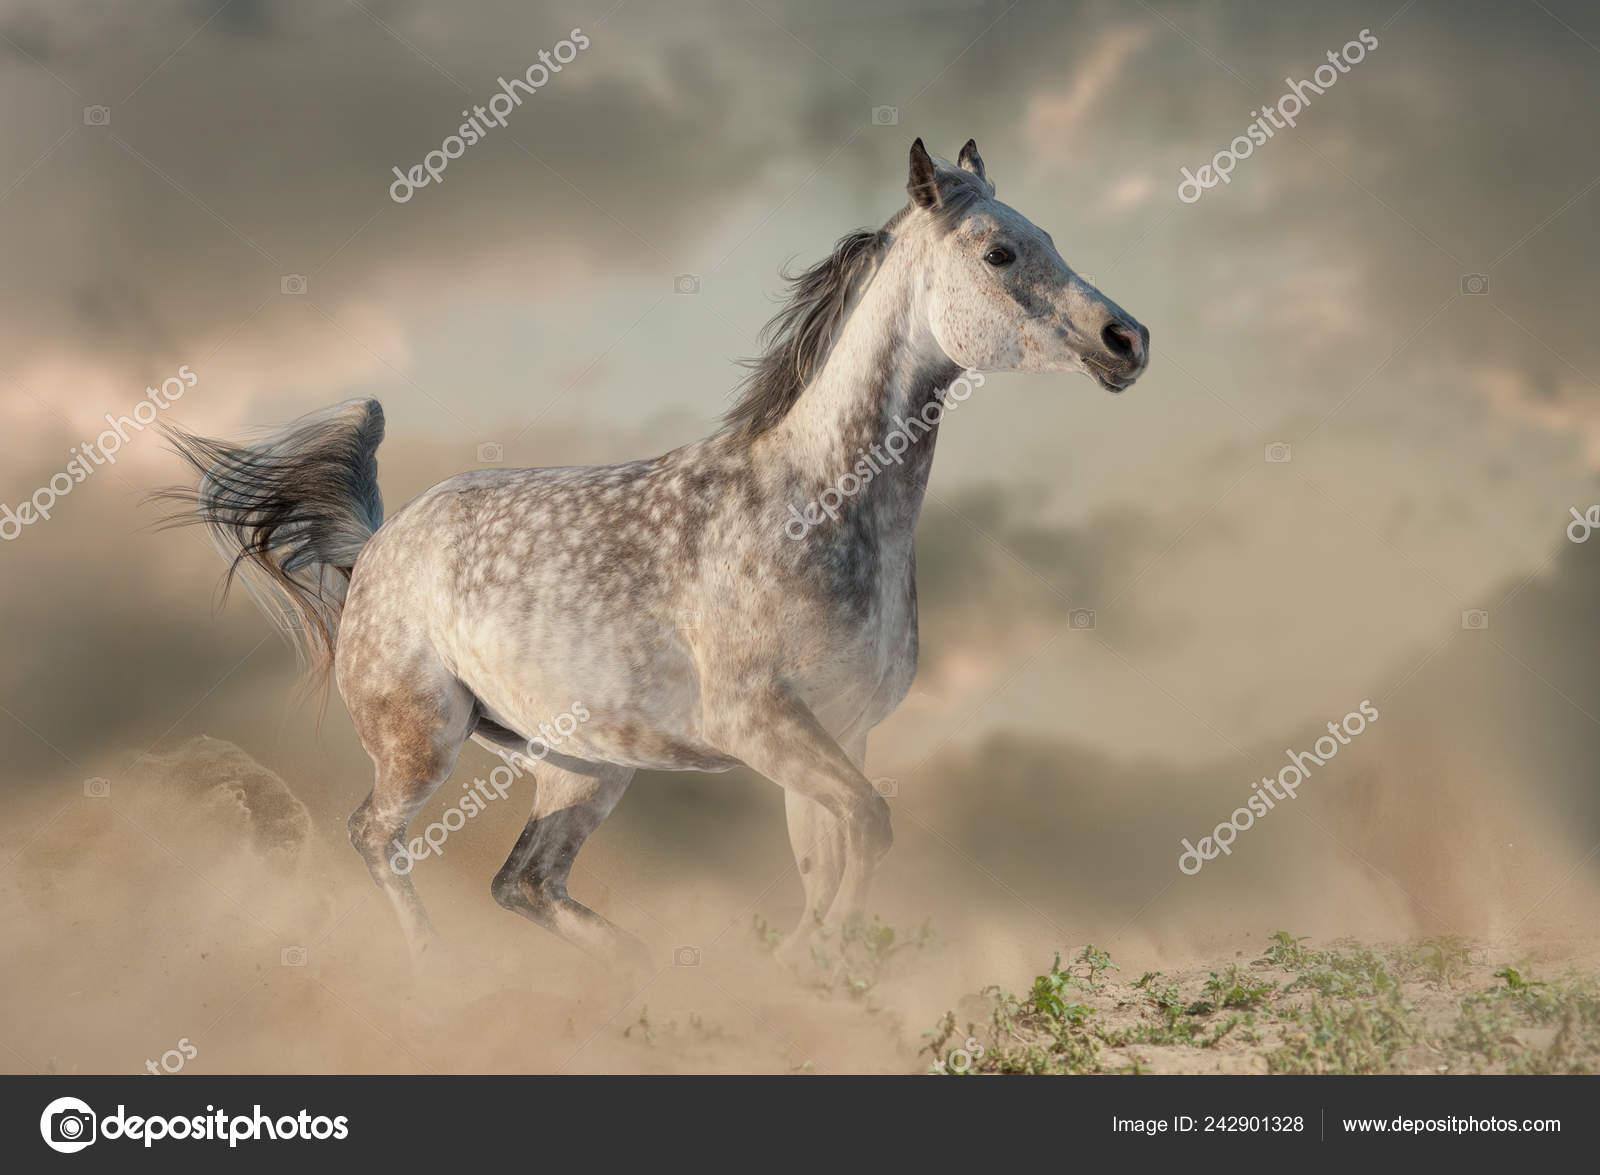 Beautiful Arabian Horse Dust Running Wild Stock Photo C Mari Art 242901328